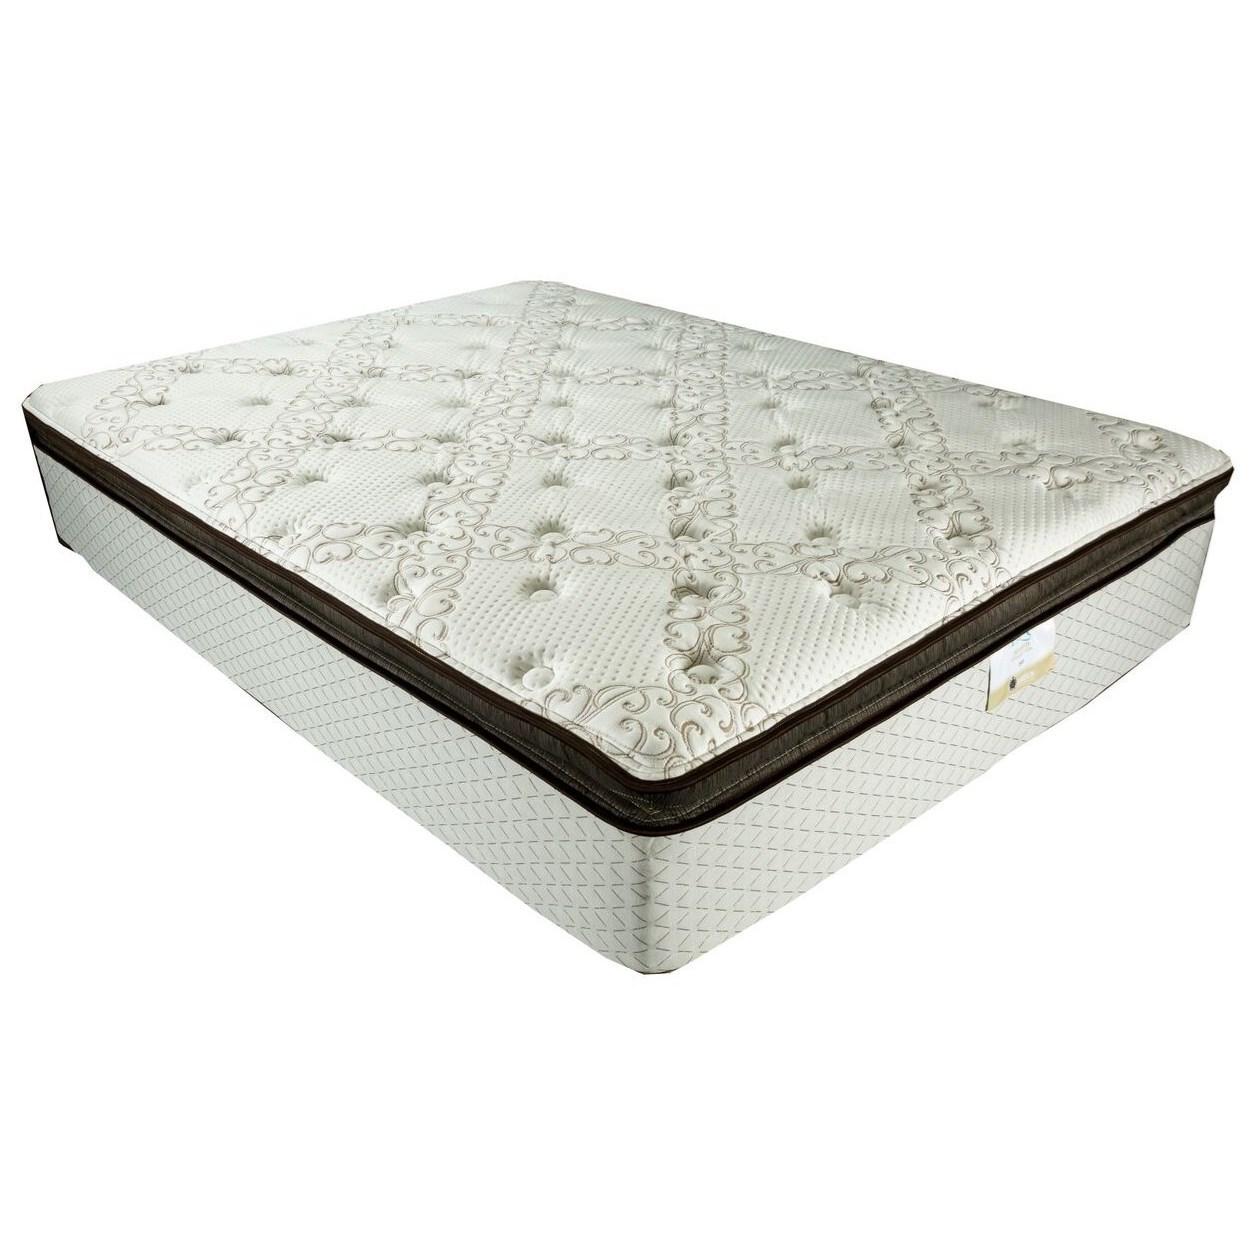 Jamison Bedding Tlc 2000 Pillow Top Tlc032 Txl Adjustable